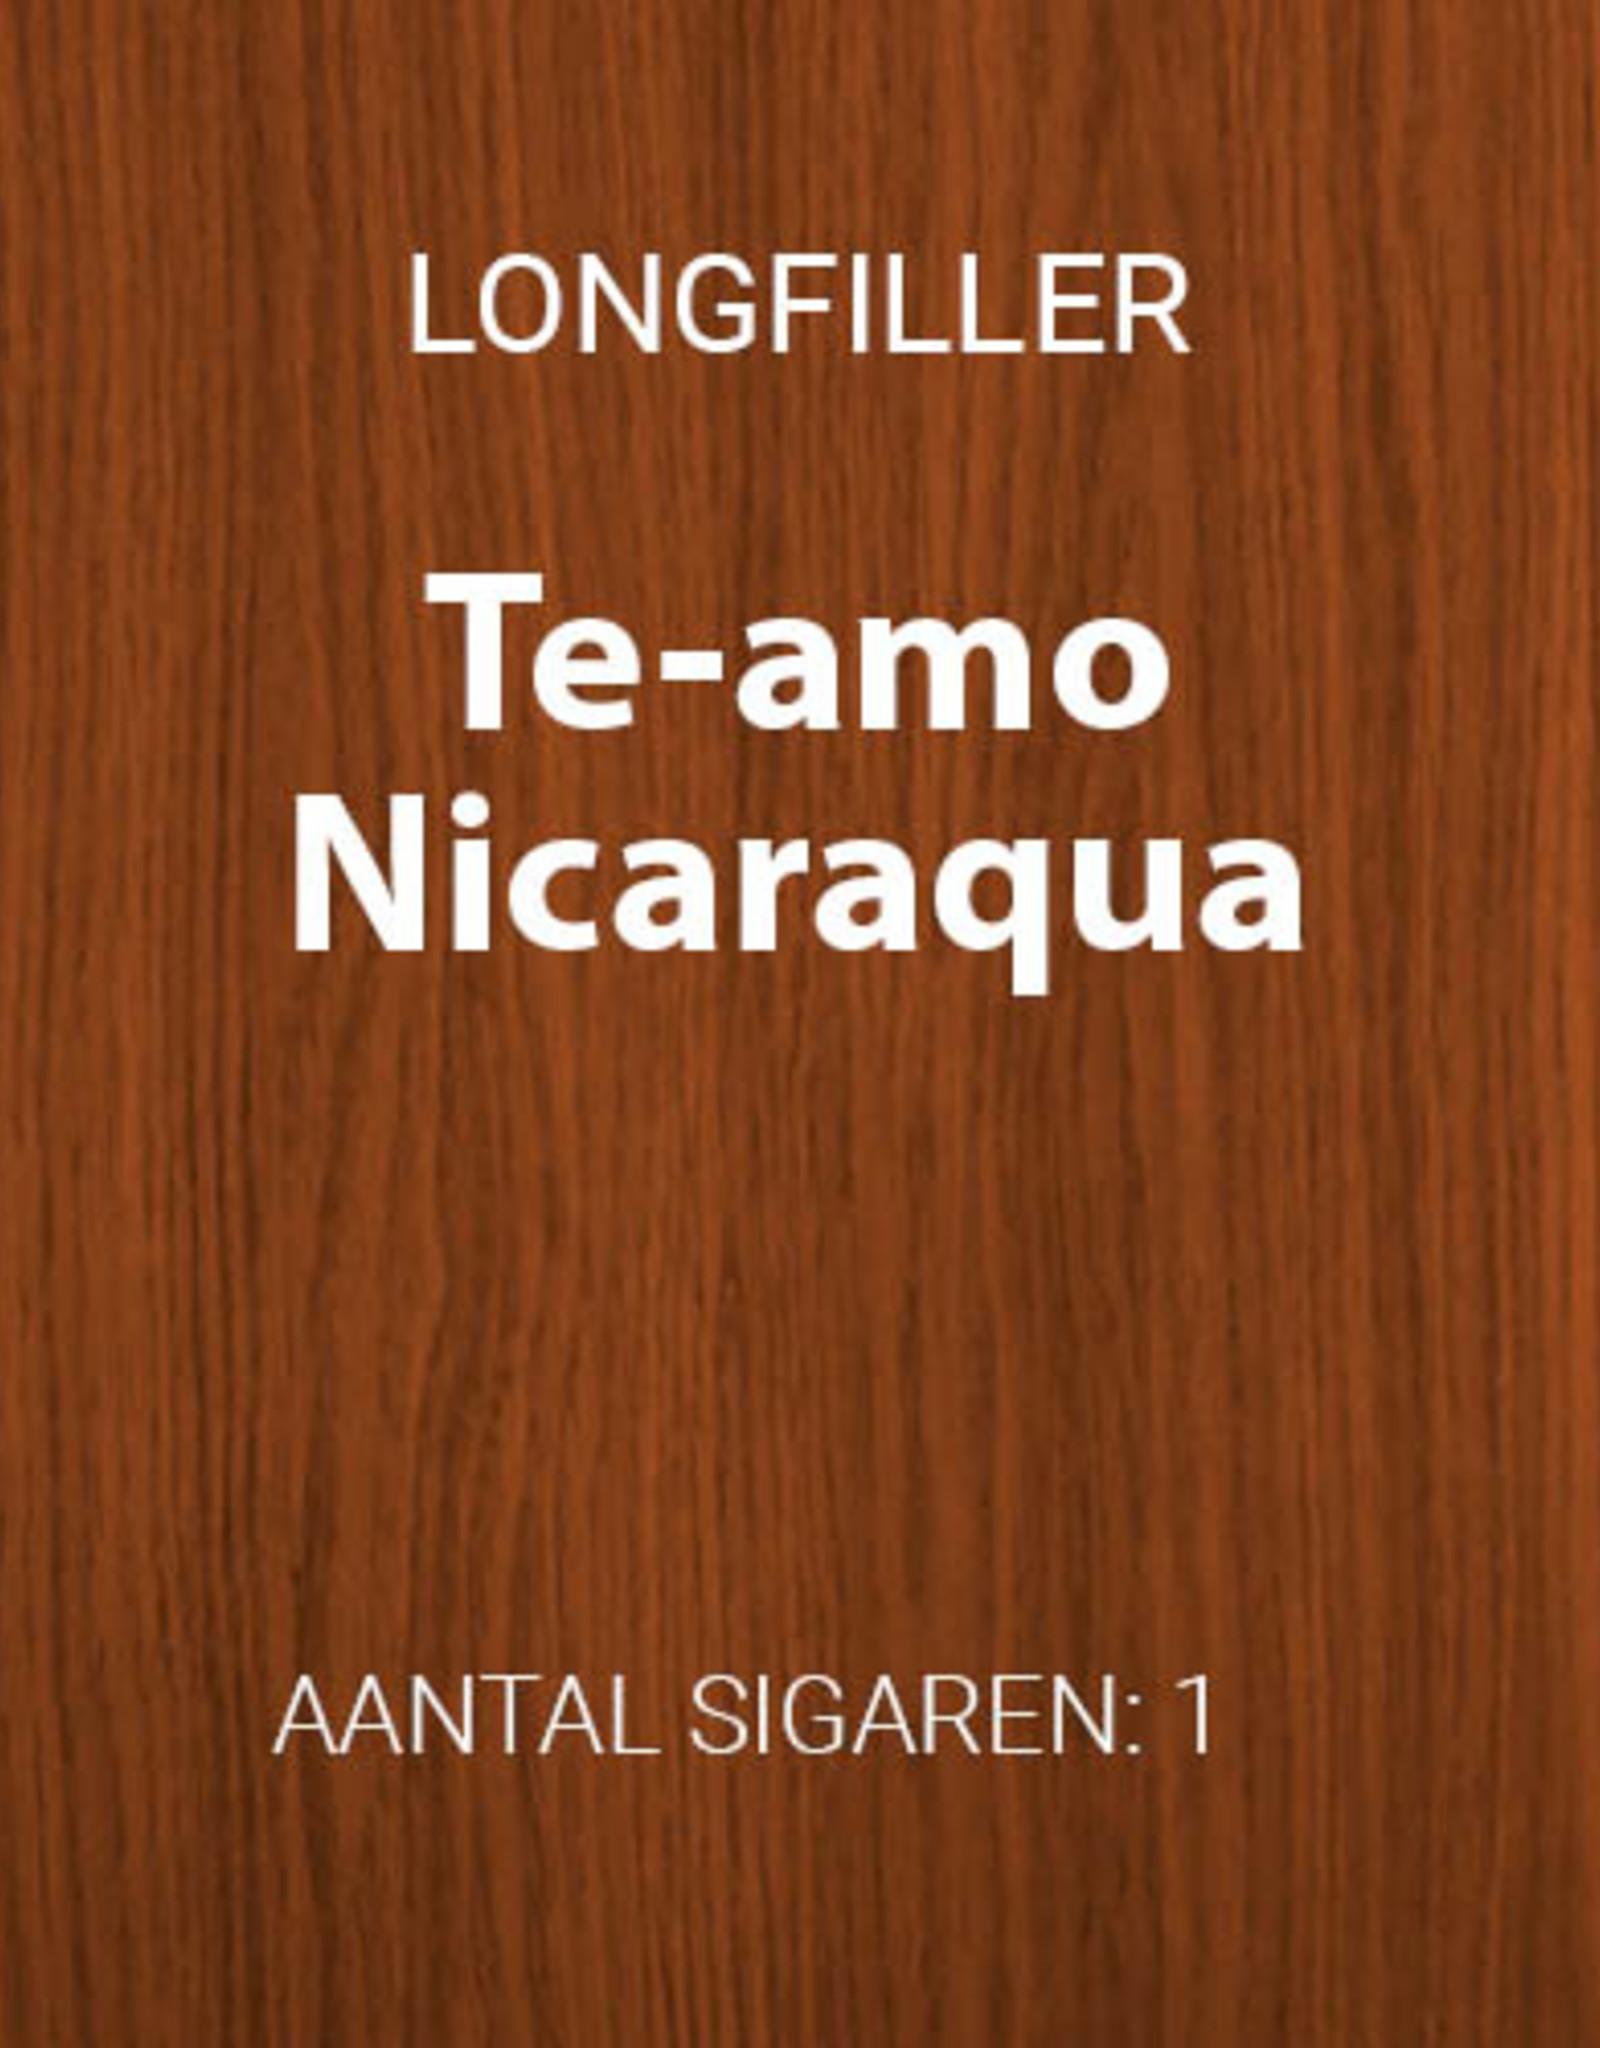 Te-Amo Nicaragua longfiller